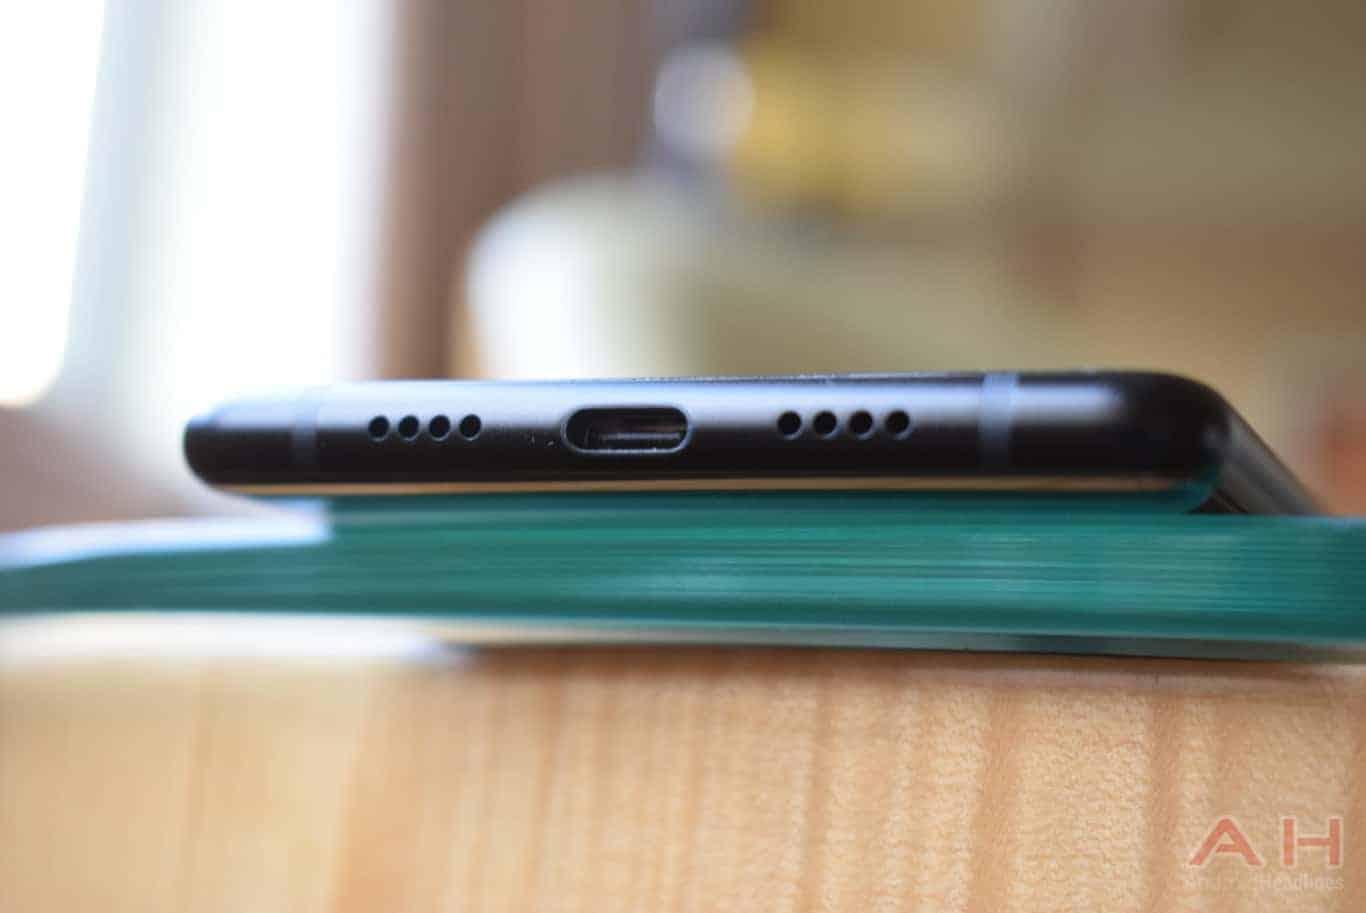 Xiaomi Mi MIX 2 Hands On AM AH 9